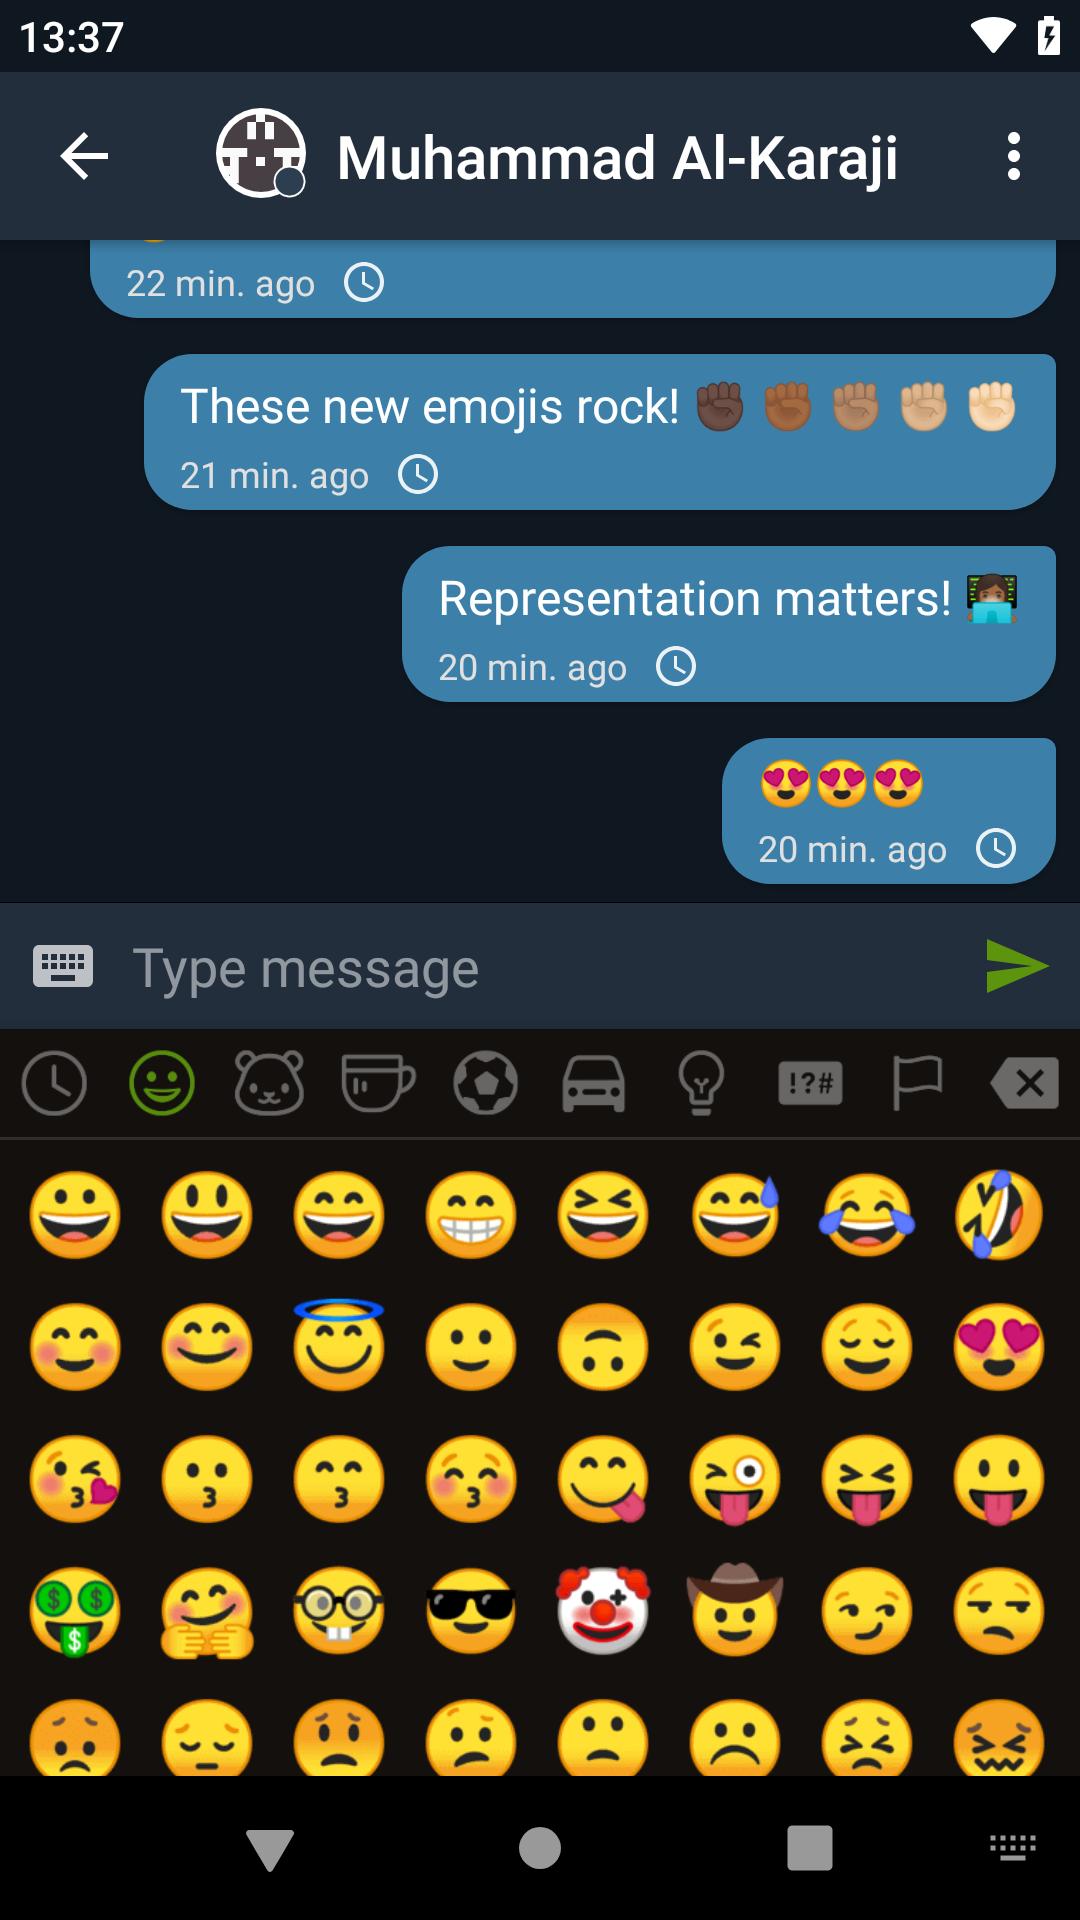 img/screenshots/11_emoji_dark.png